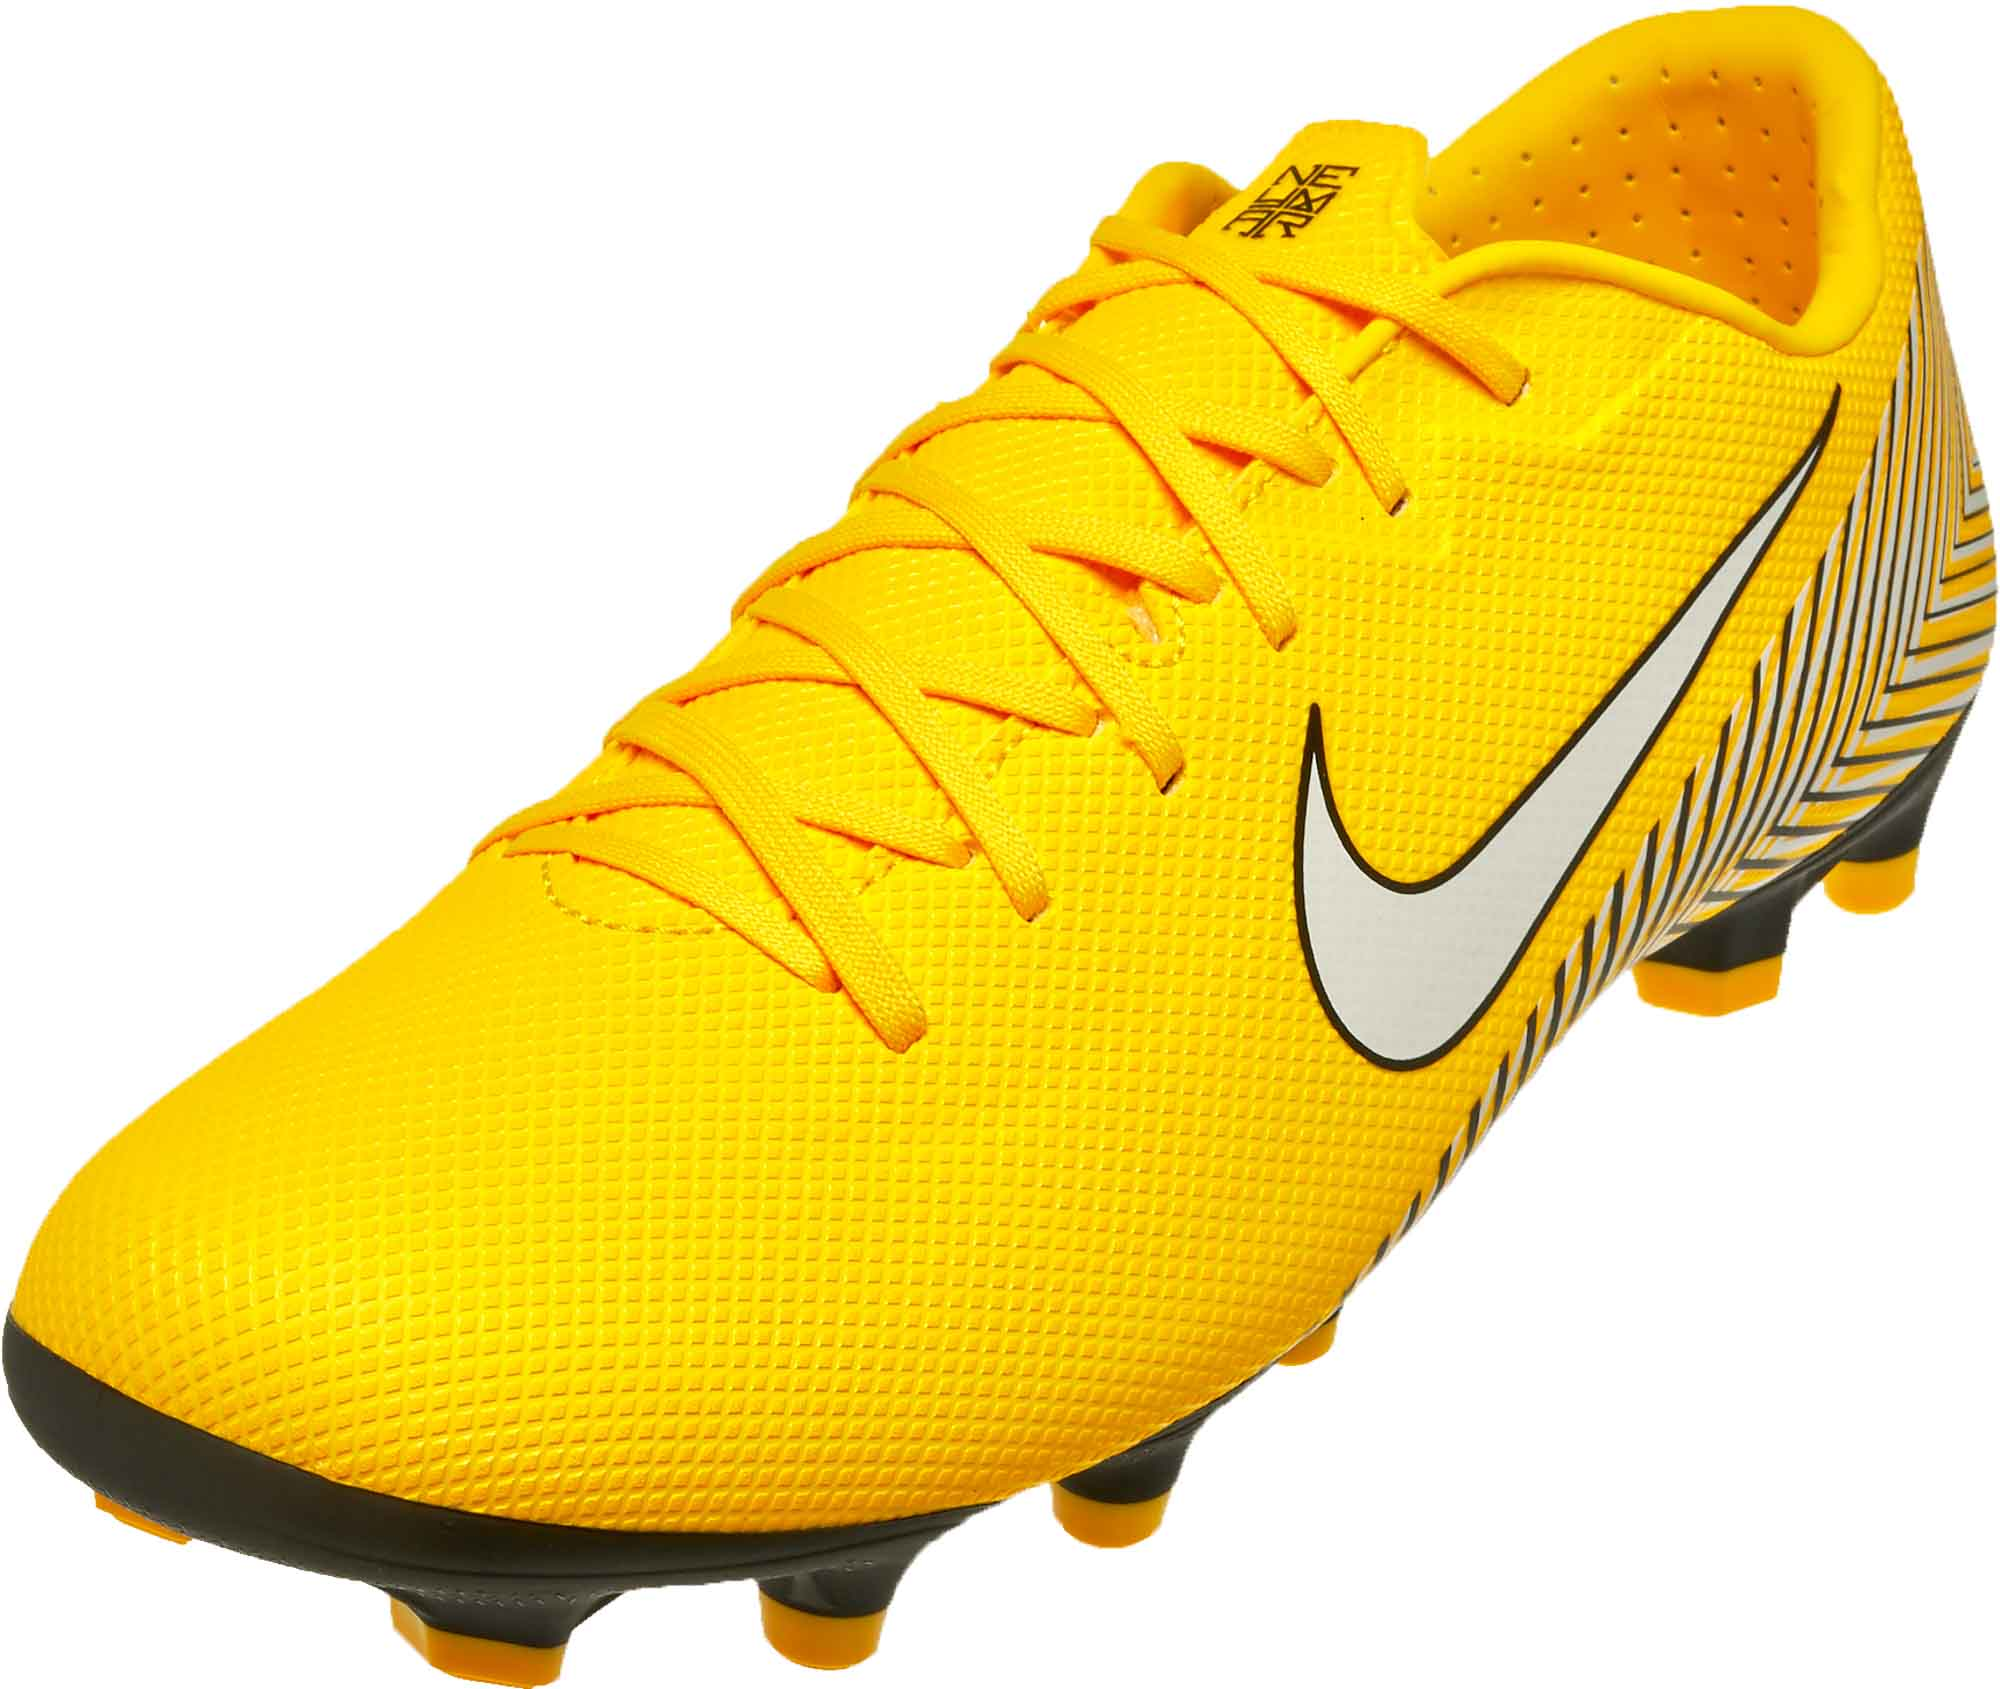 eb5b73266132e Nike Neymar Vapor 12 Academy MG - Amarillo/White/Black - SoccerPro